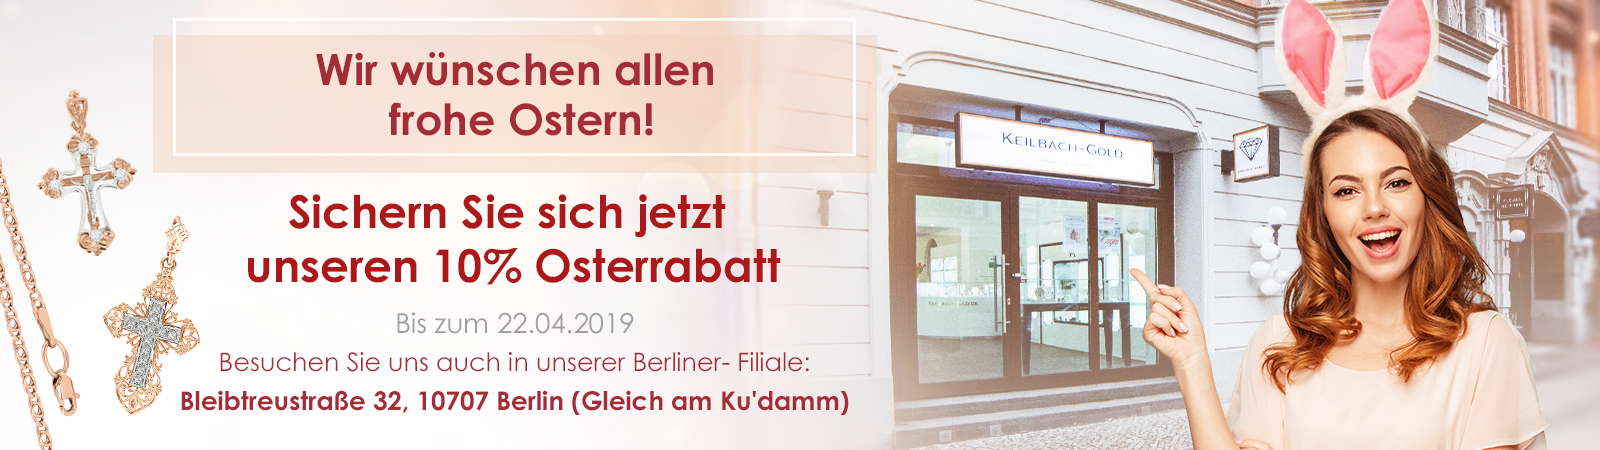 Ostern 10% Rabatt_Berlin